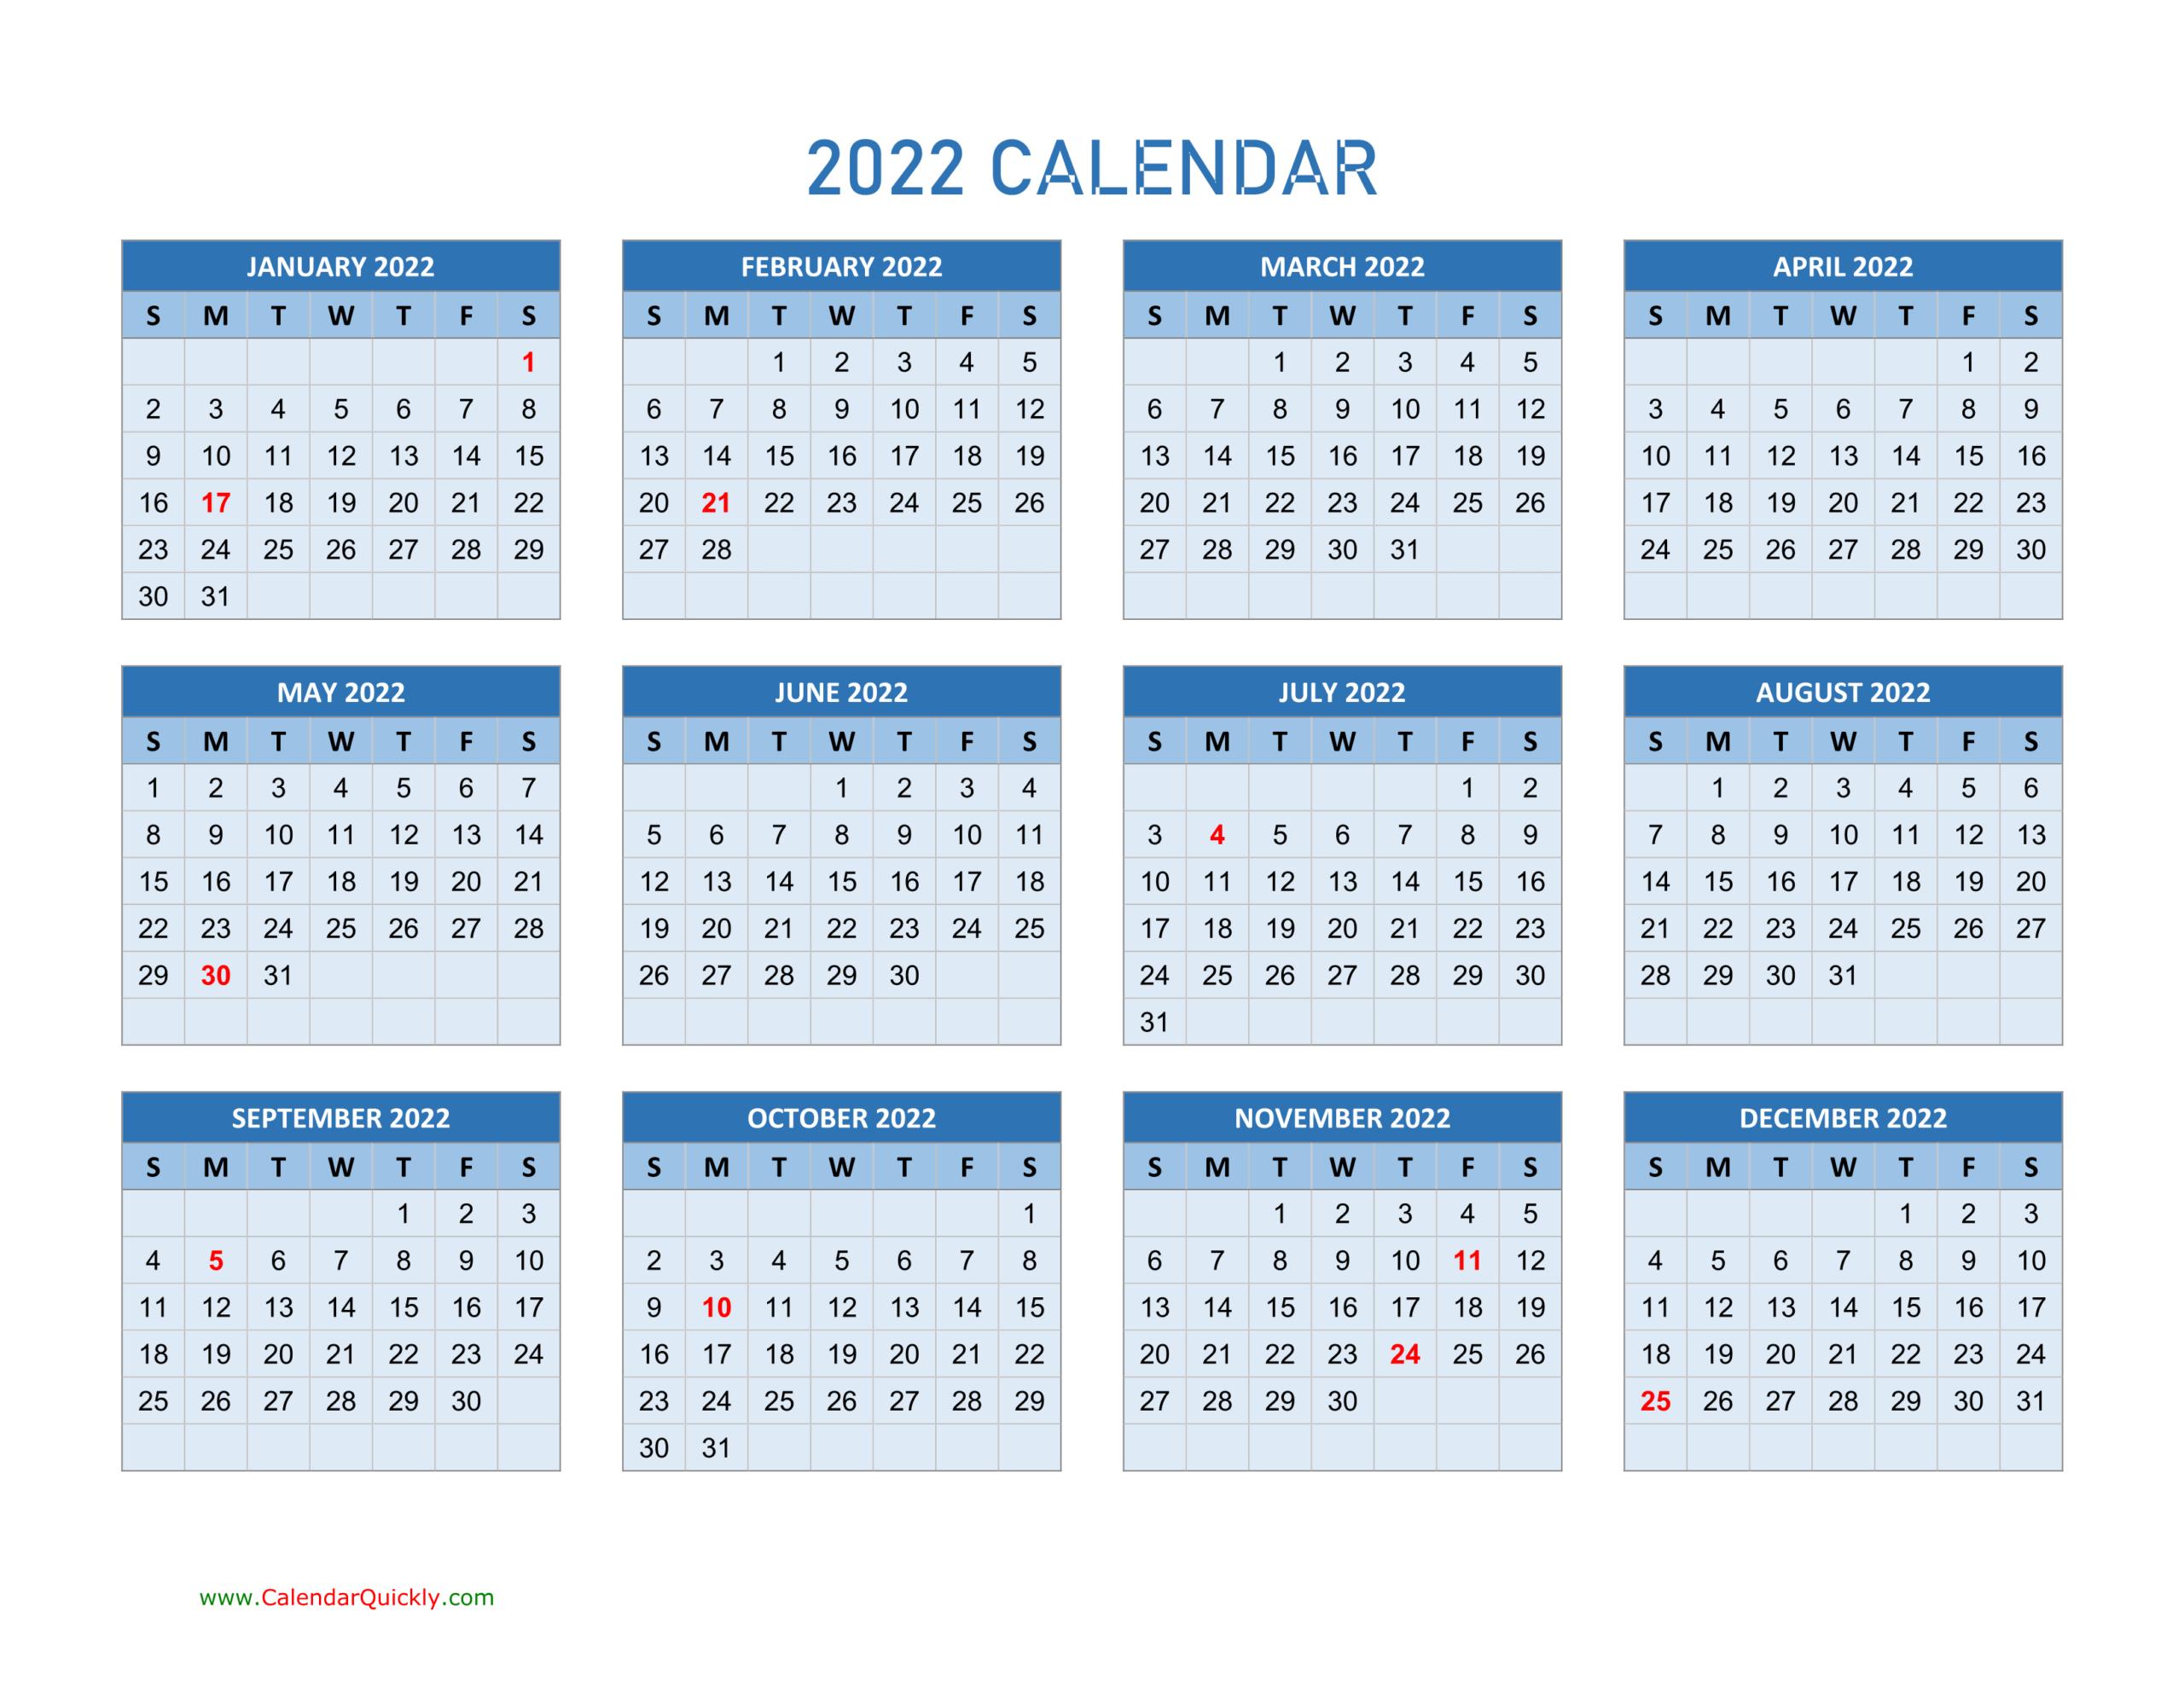 Year 2022 Calendars